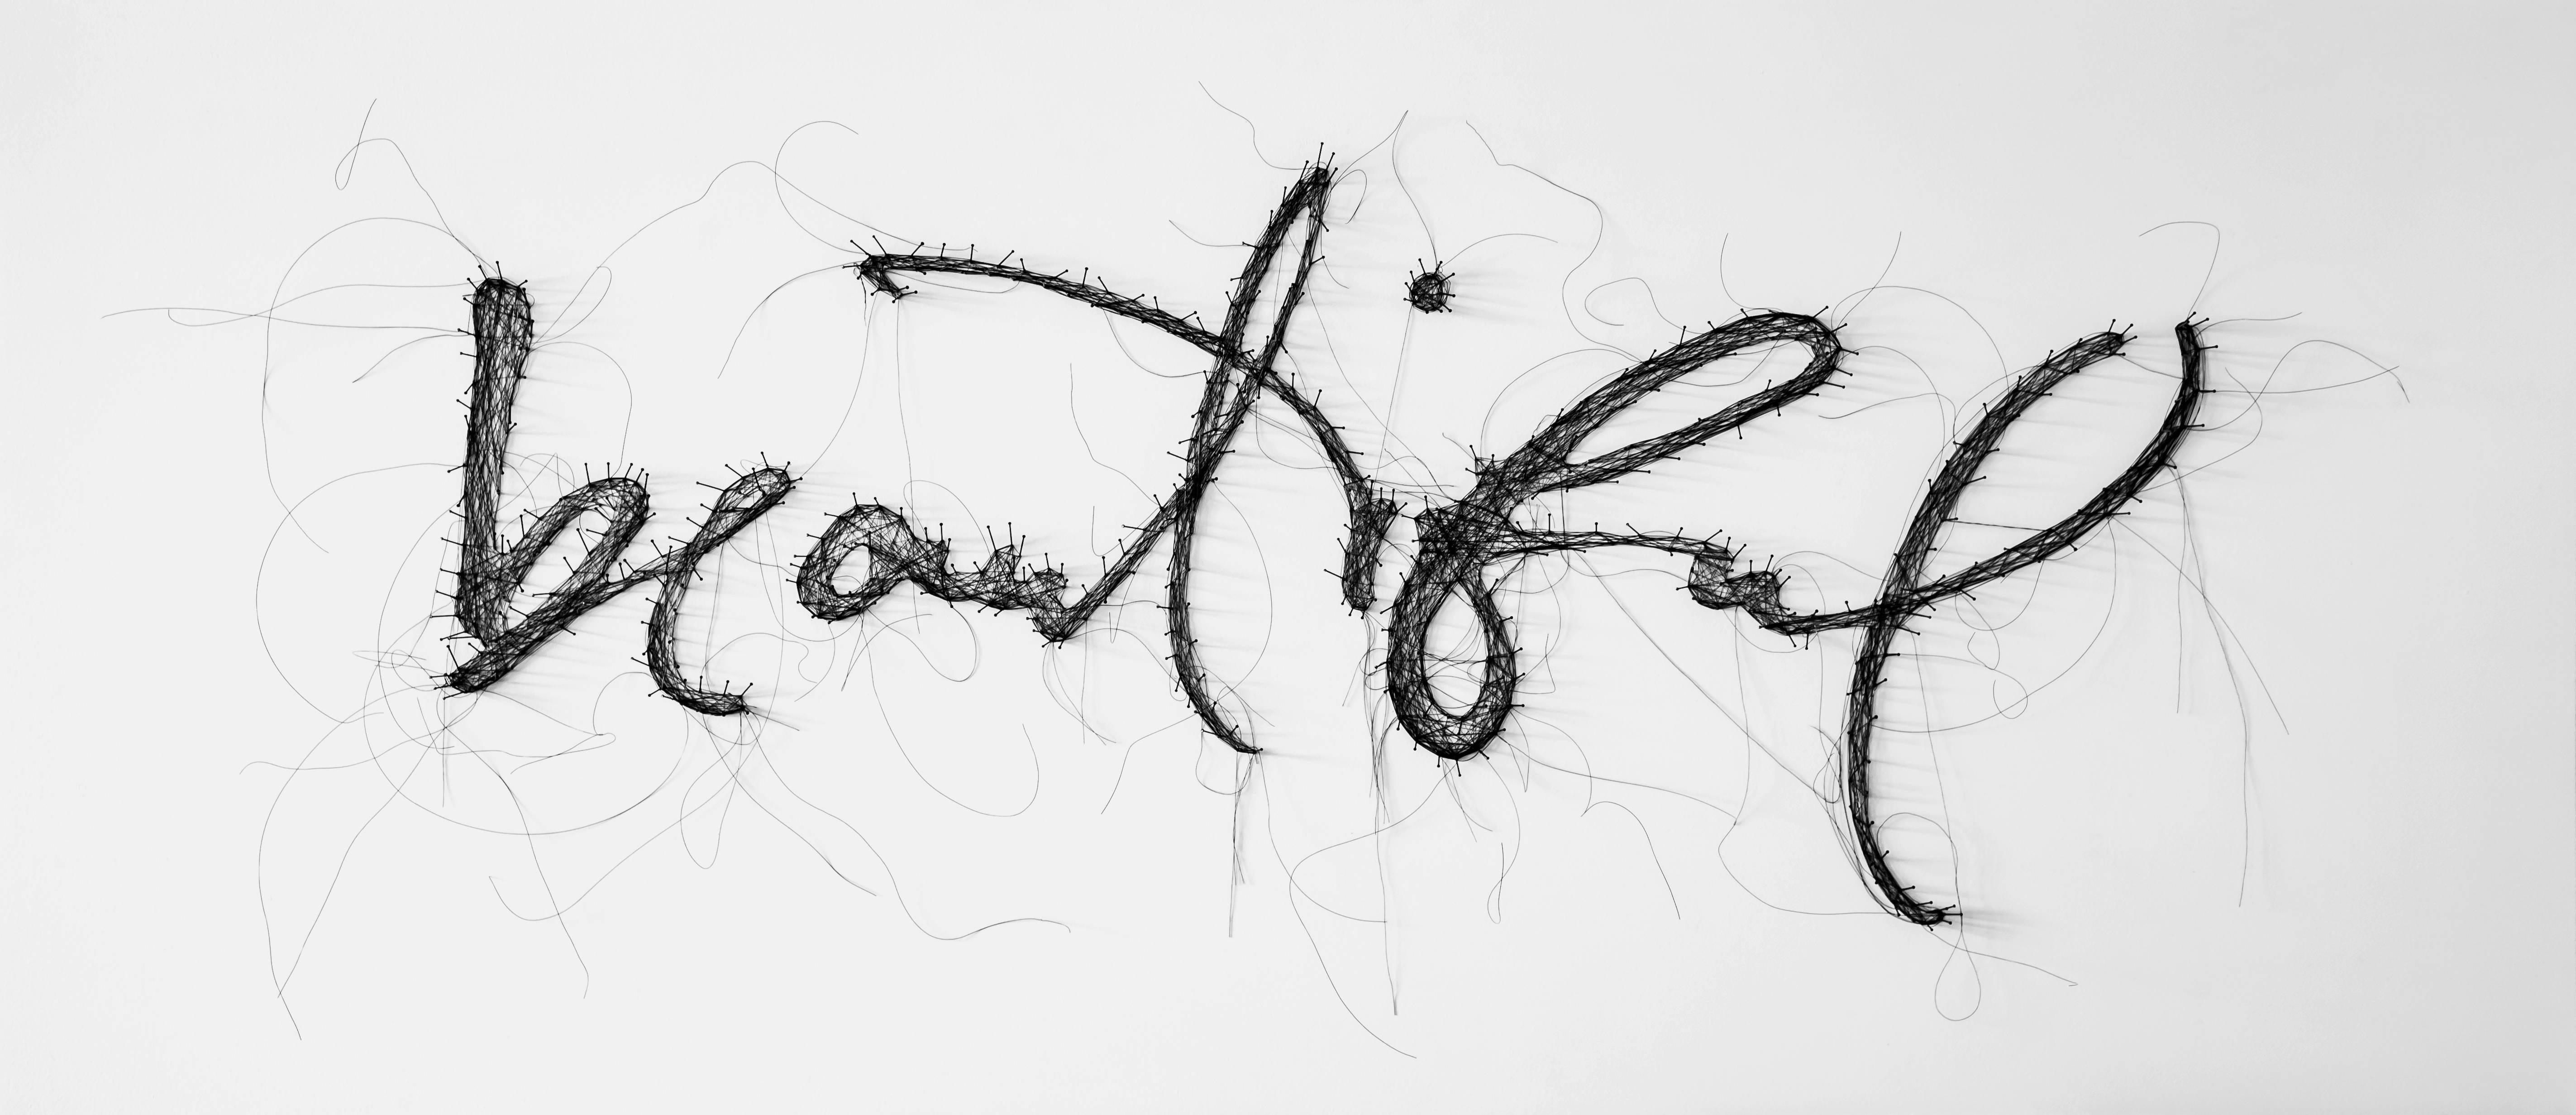 Beautiful - contemporary mixed media thread pins writing artwork framed glazed